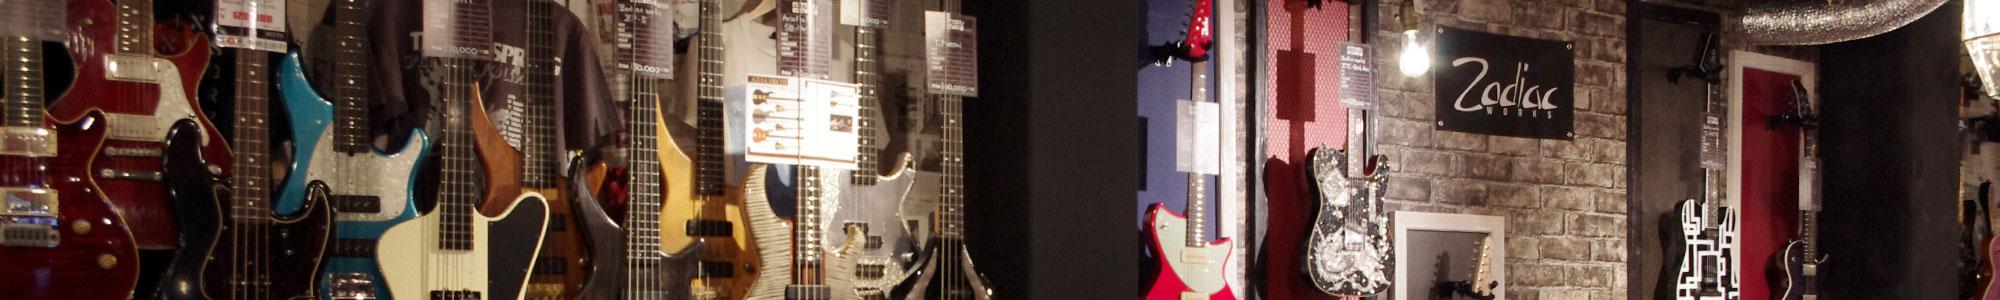 ギター・楽器・音響家電